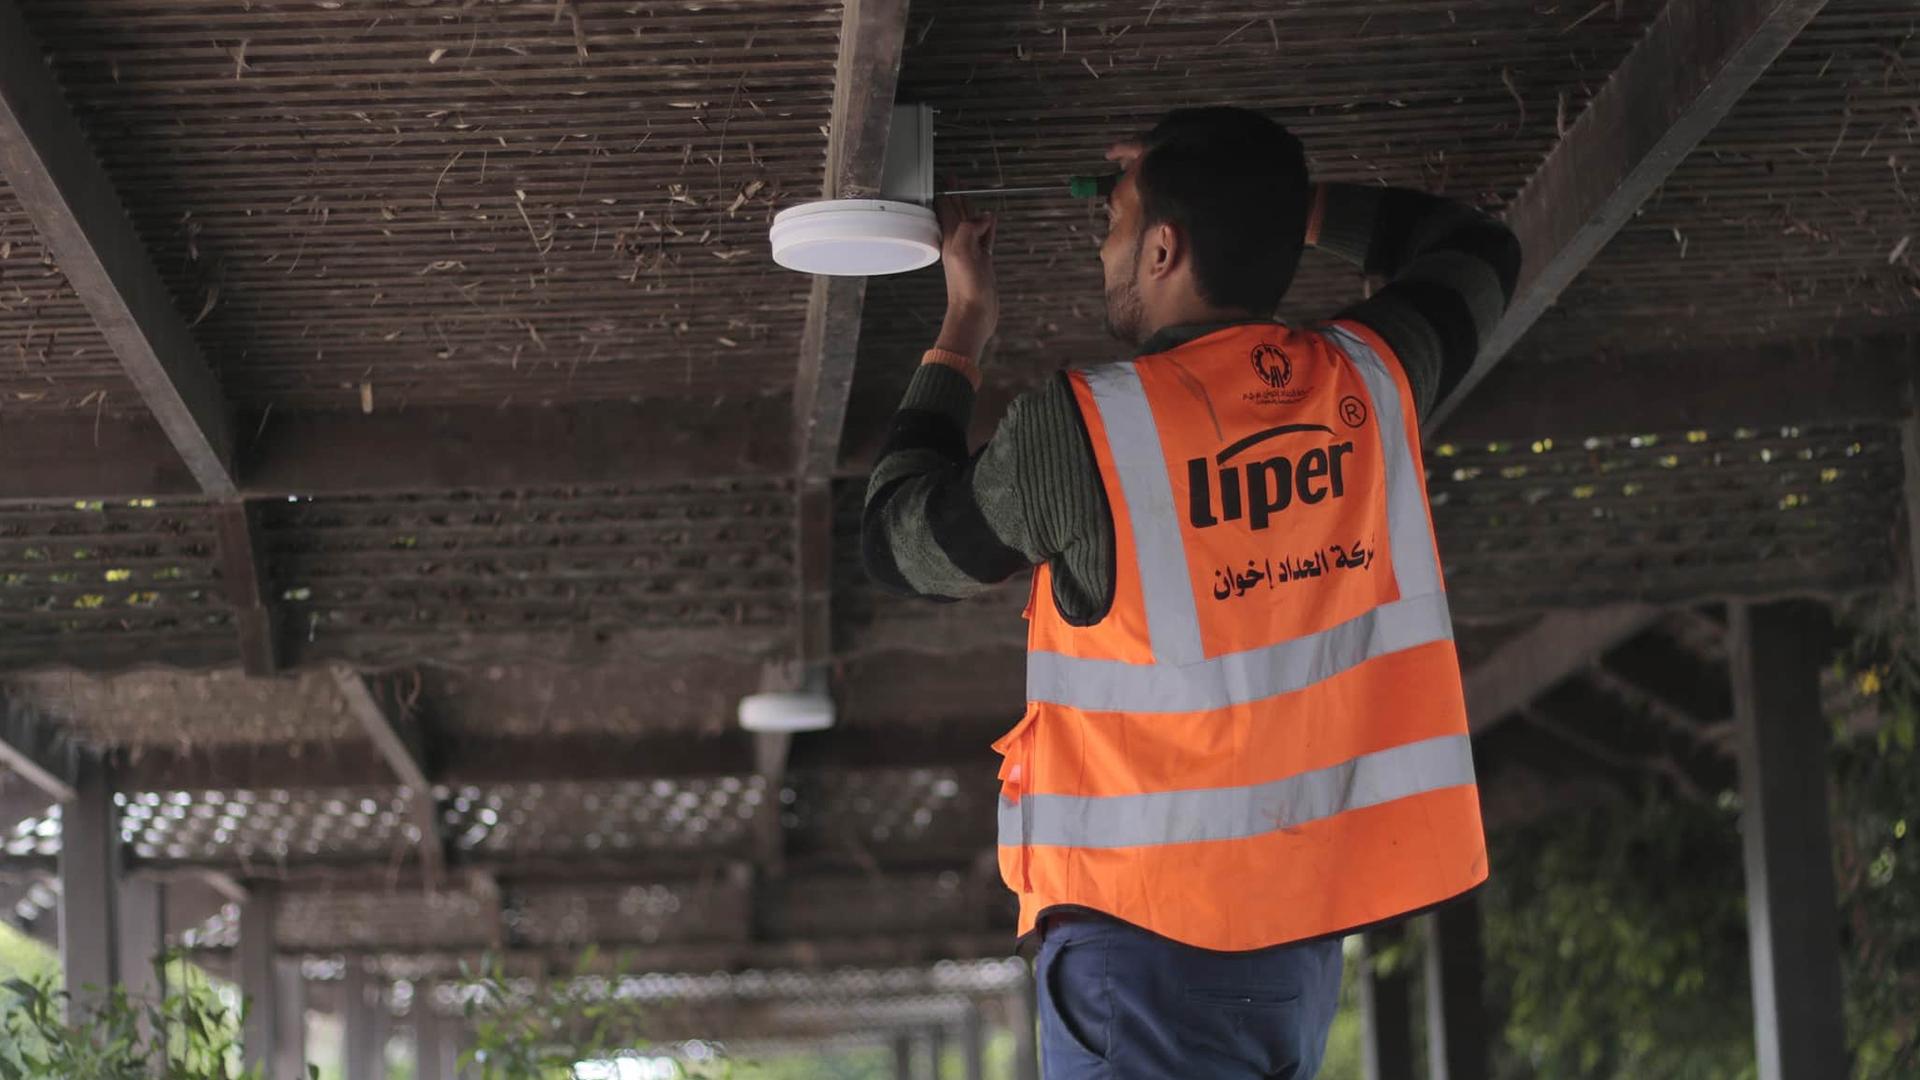 Liper lighting team (4)